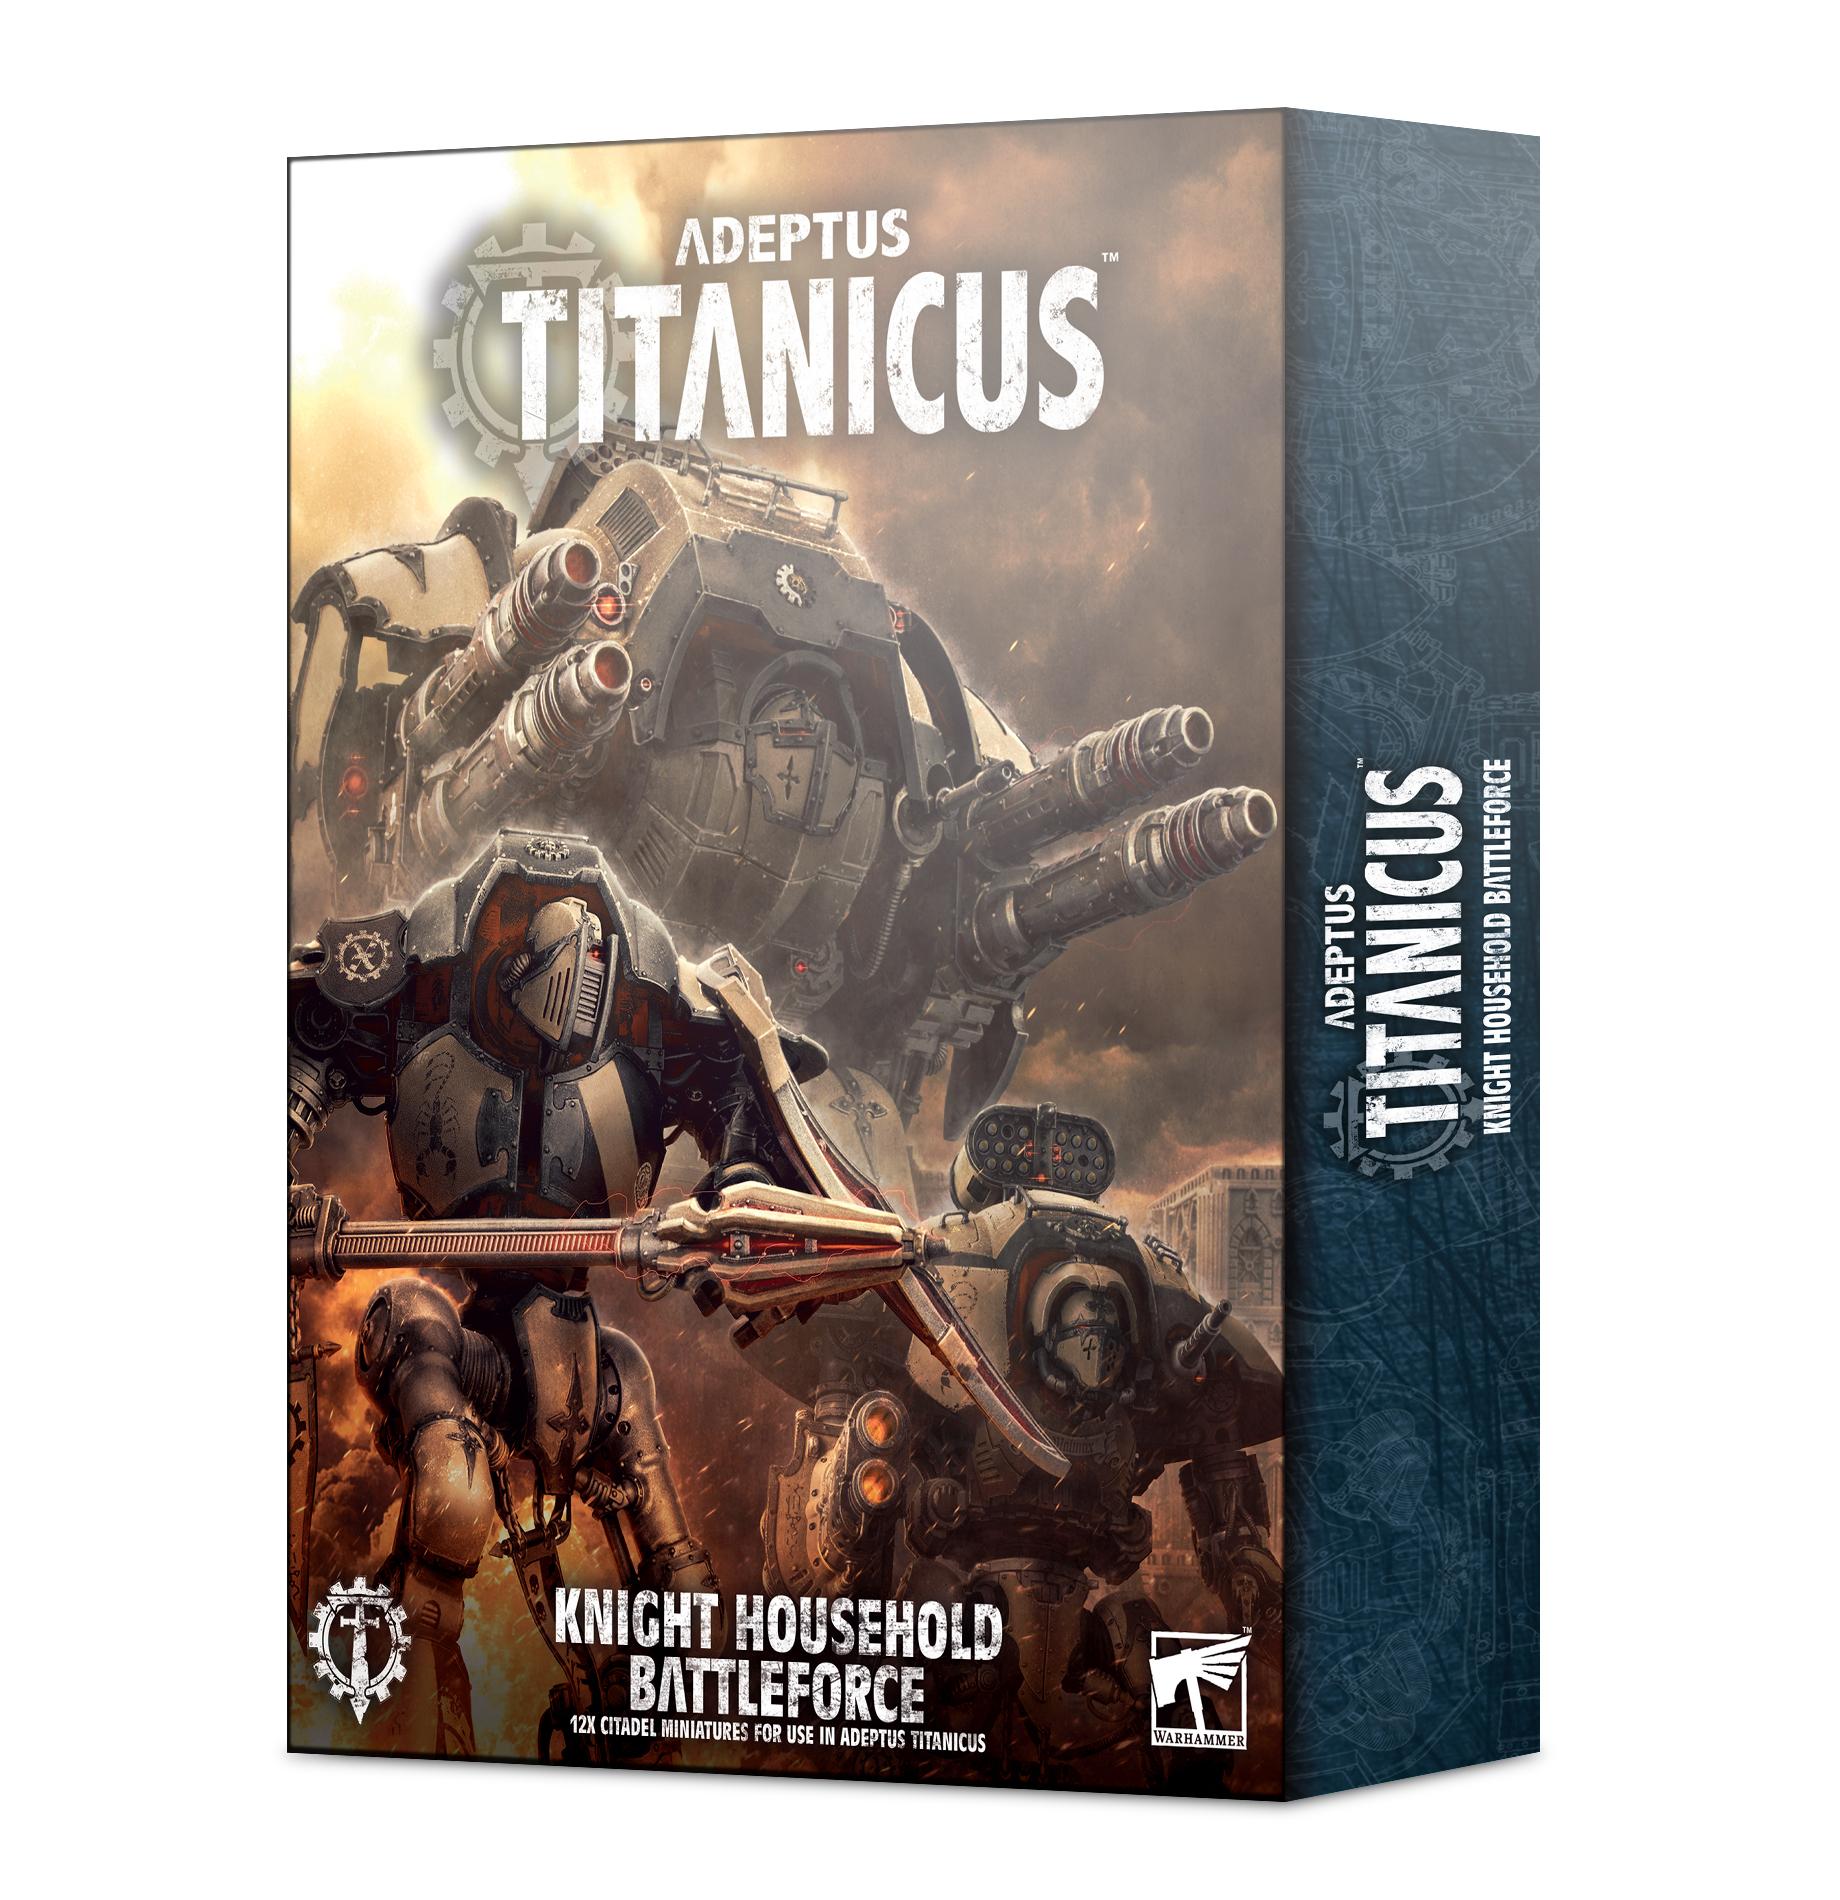 Knight Battleforce, Adeptus Titanicus